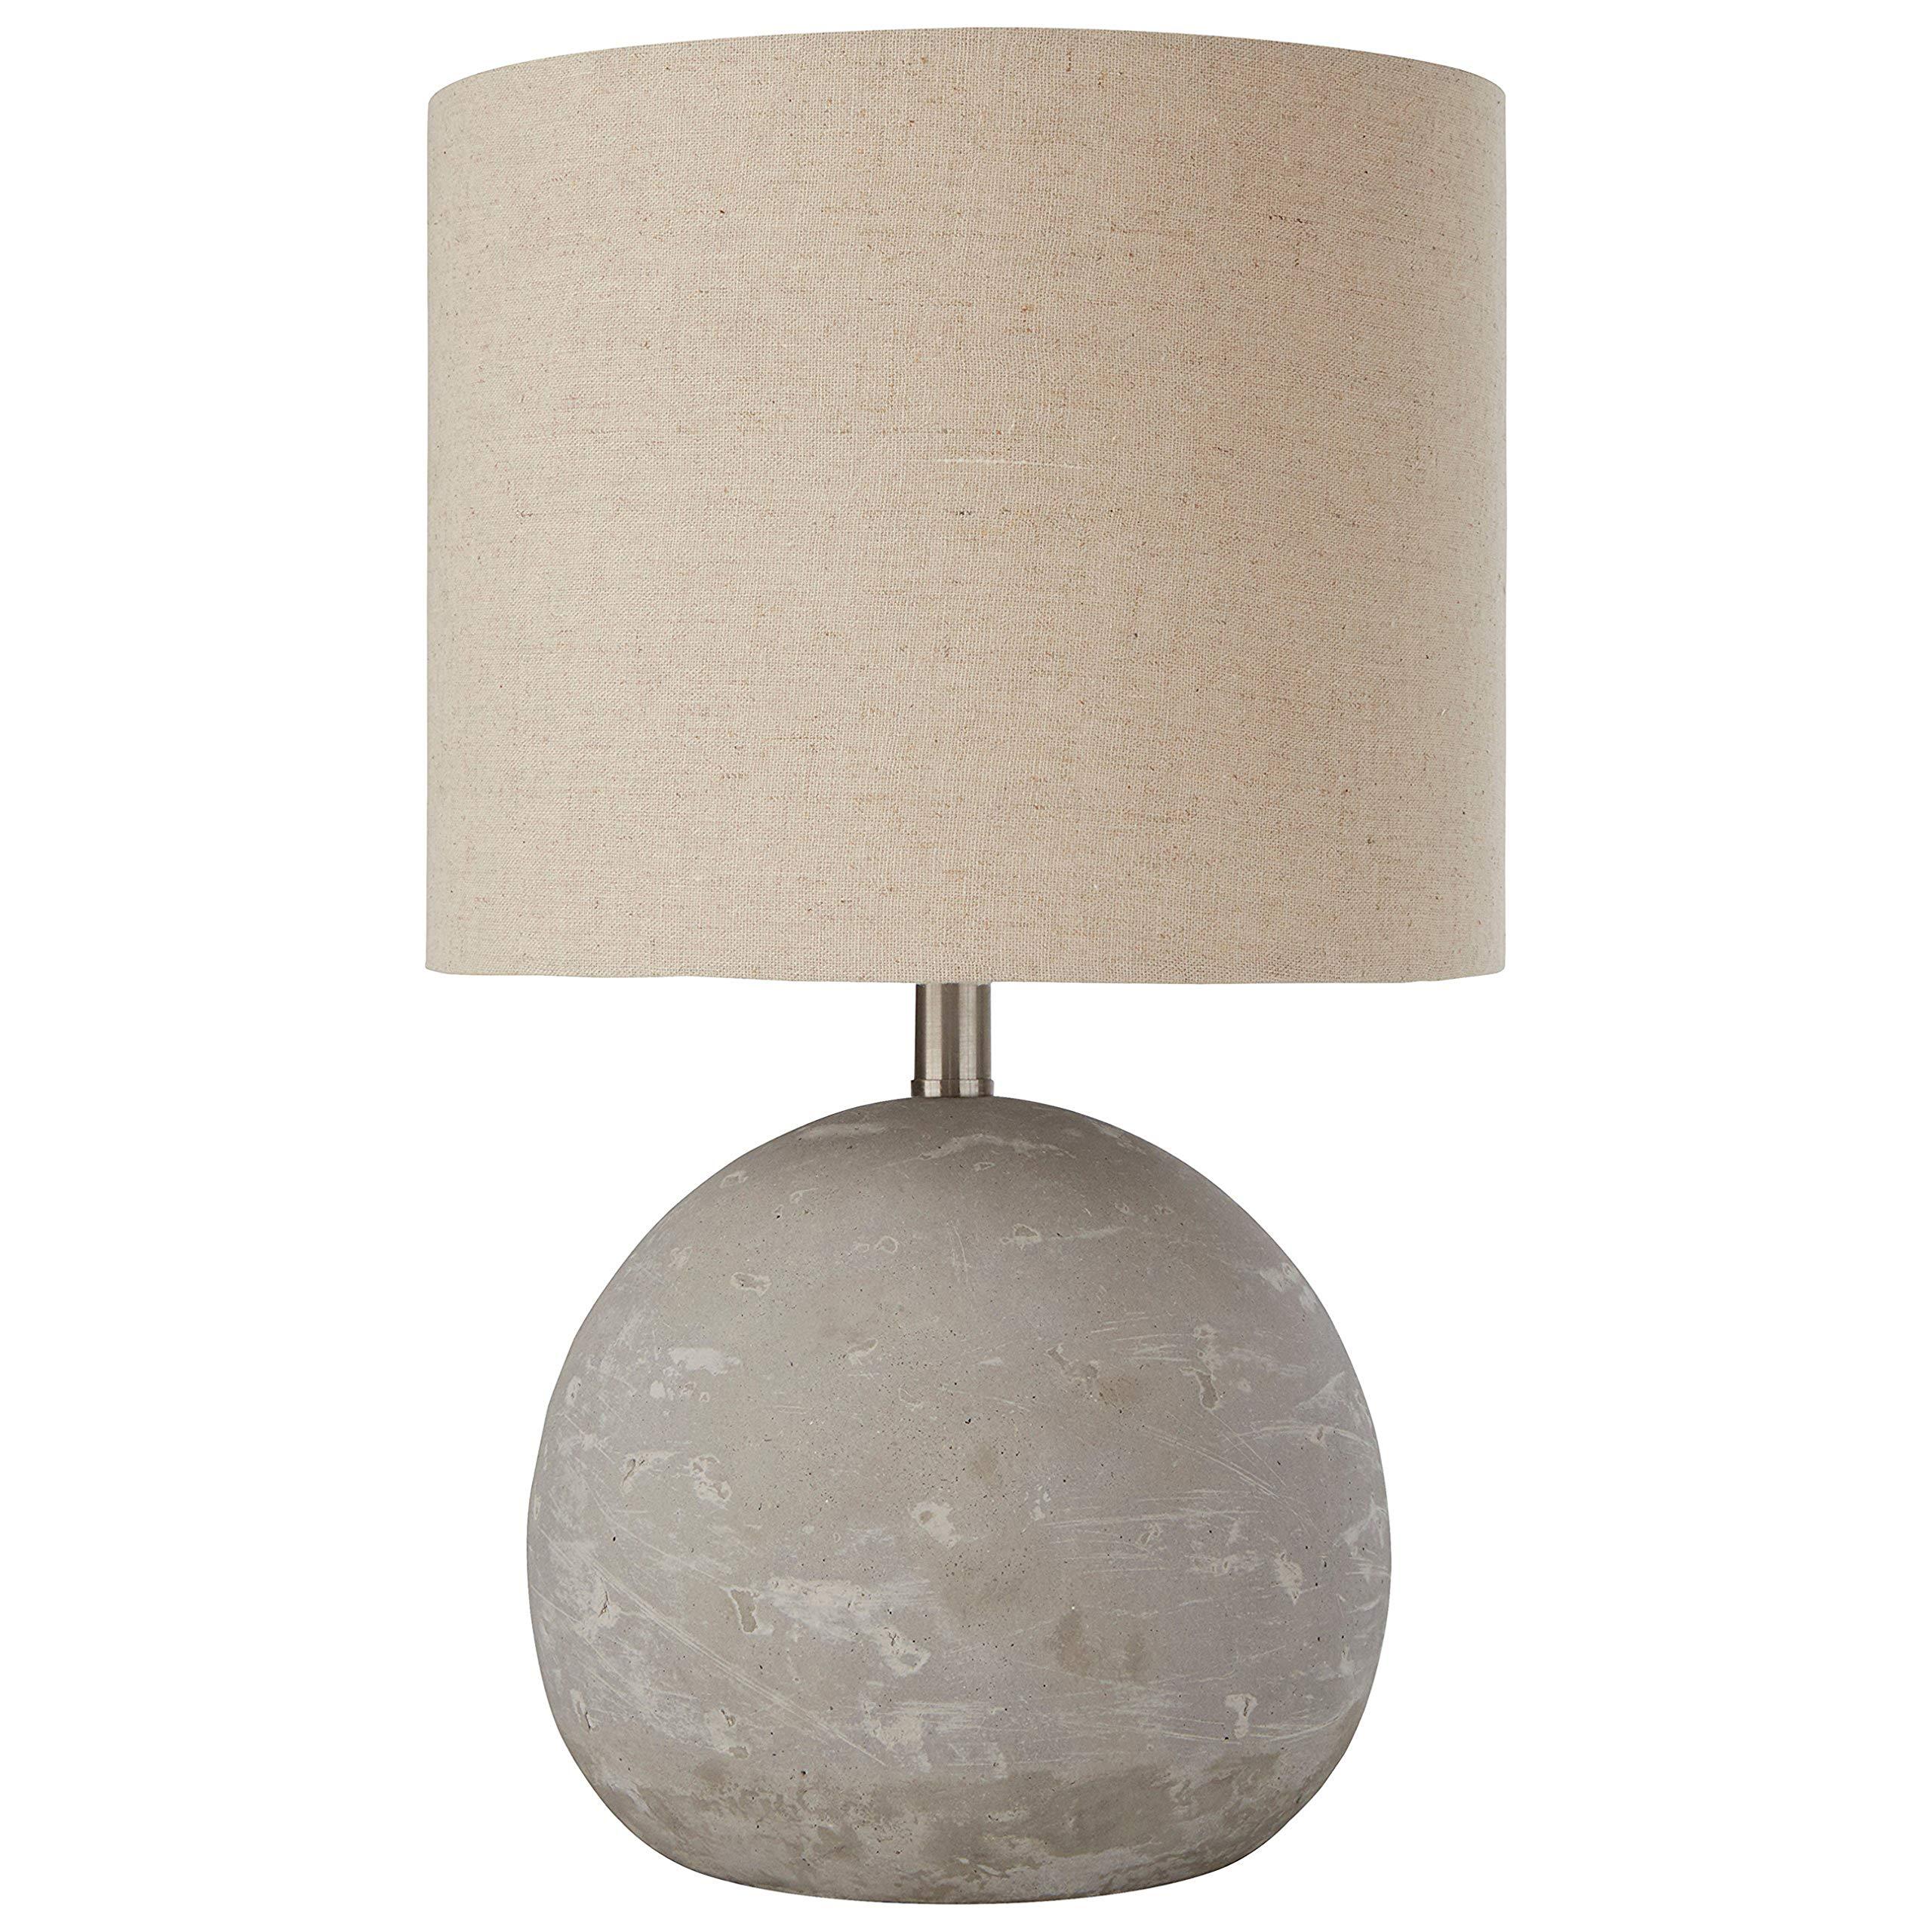 lamp parts amazon comLamp Parts And Repair Lamp Doctor Broken Antique Brass Floor Lamp #18